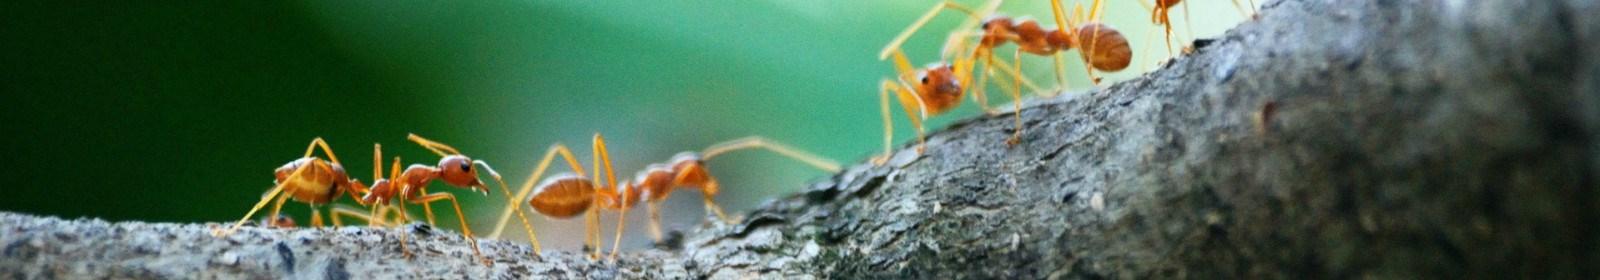 Pest Control - Some Green Alternatives